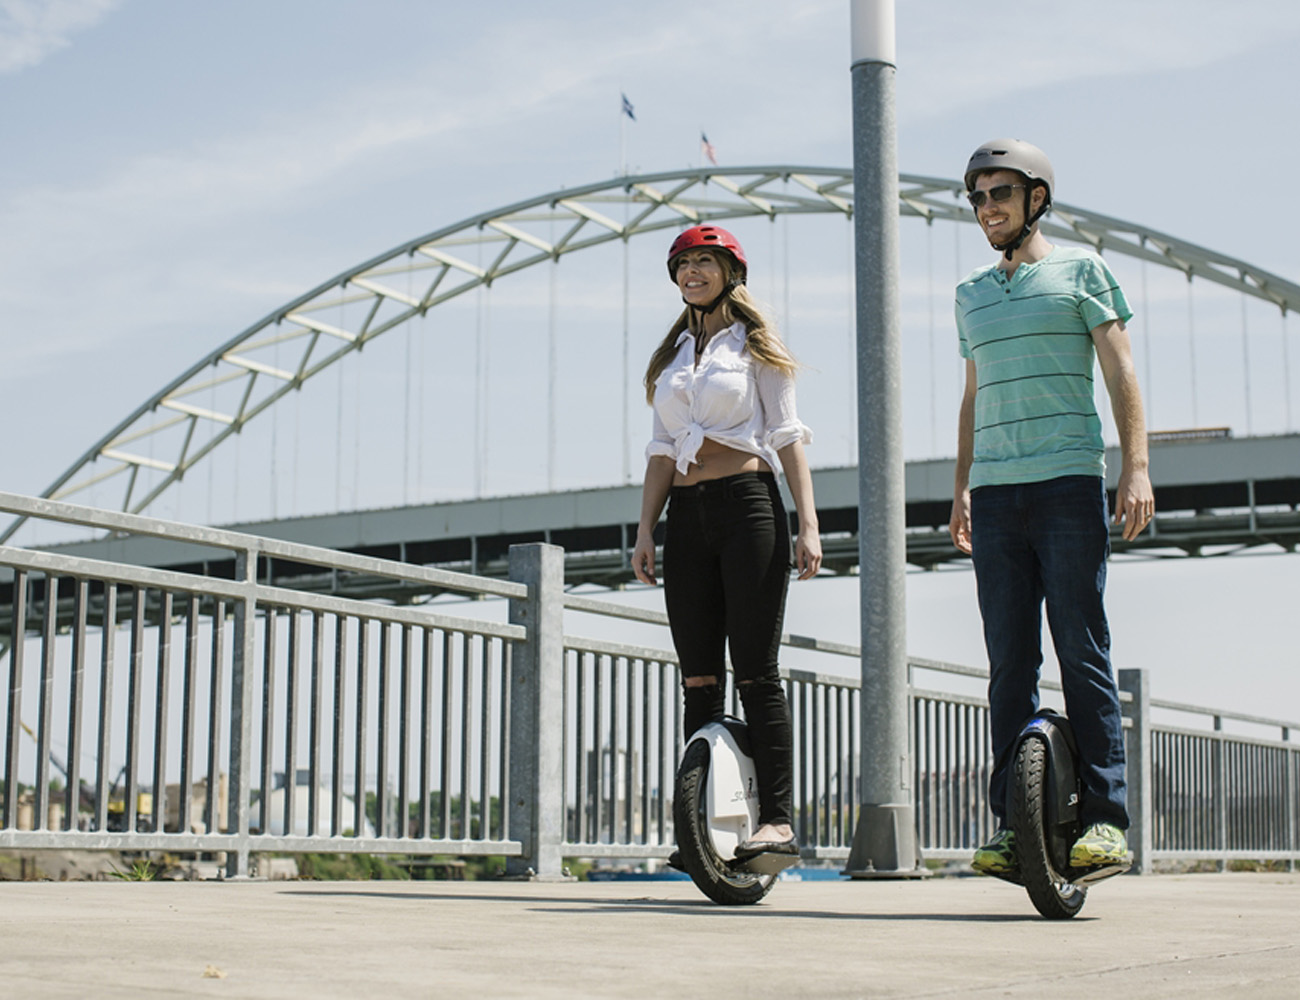 solowheel-xtreme-electric-unicycle-05